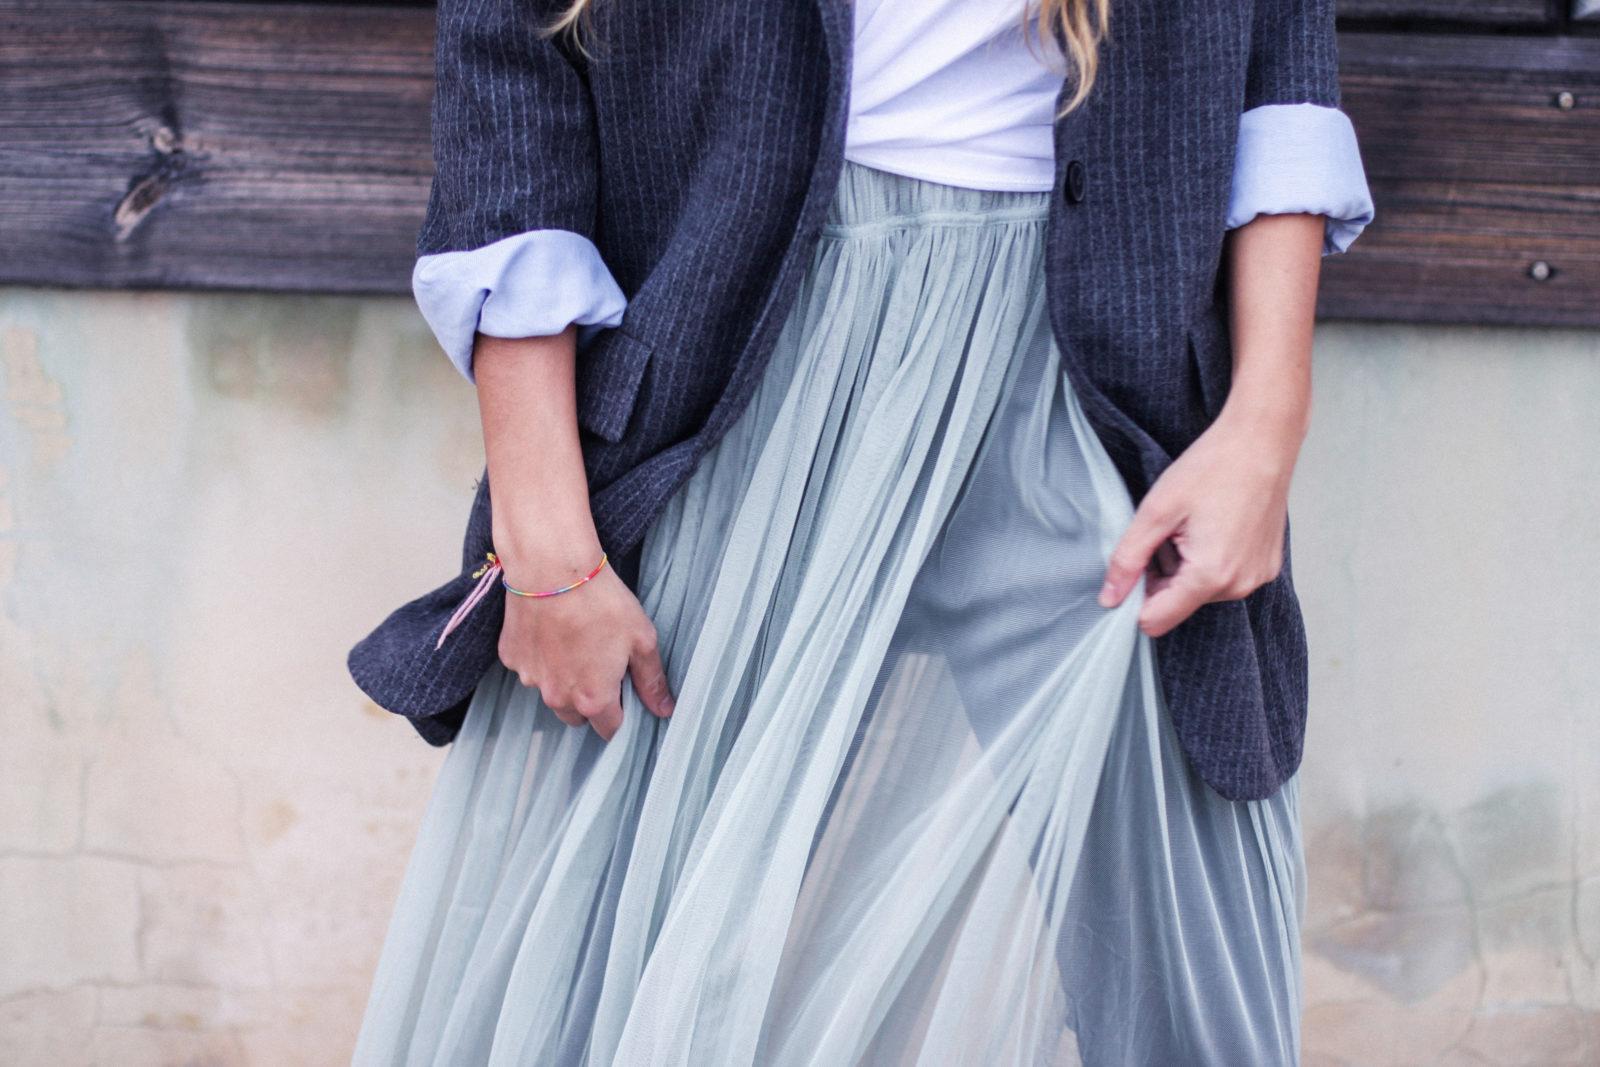 vestido_de_tul_sobre_pantalon_estilo_bailarina_blazer_oversize_pendientes_de_aros_choker_tendencias_trends_fall_2016_street_style_donkeycool-19